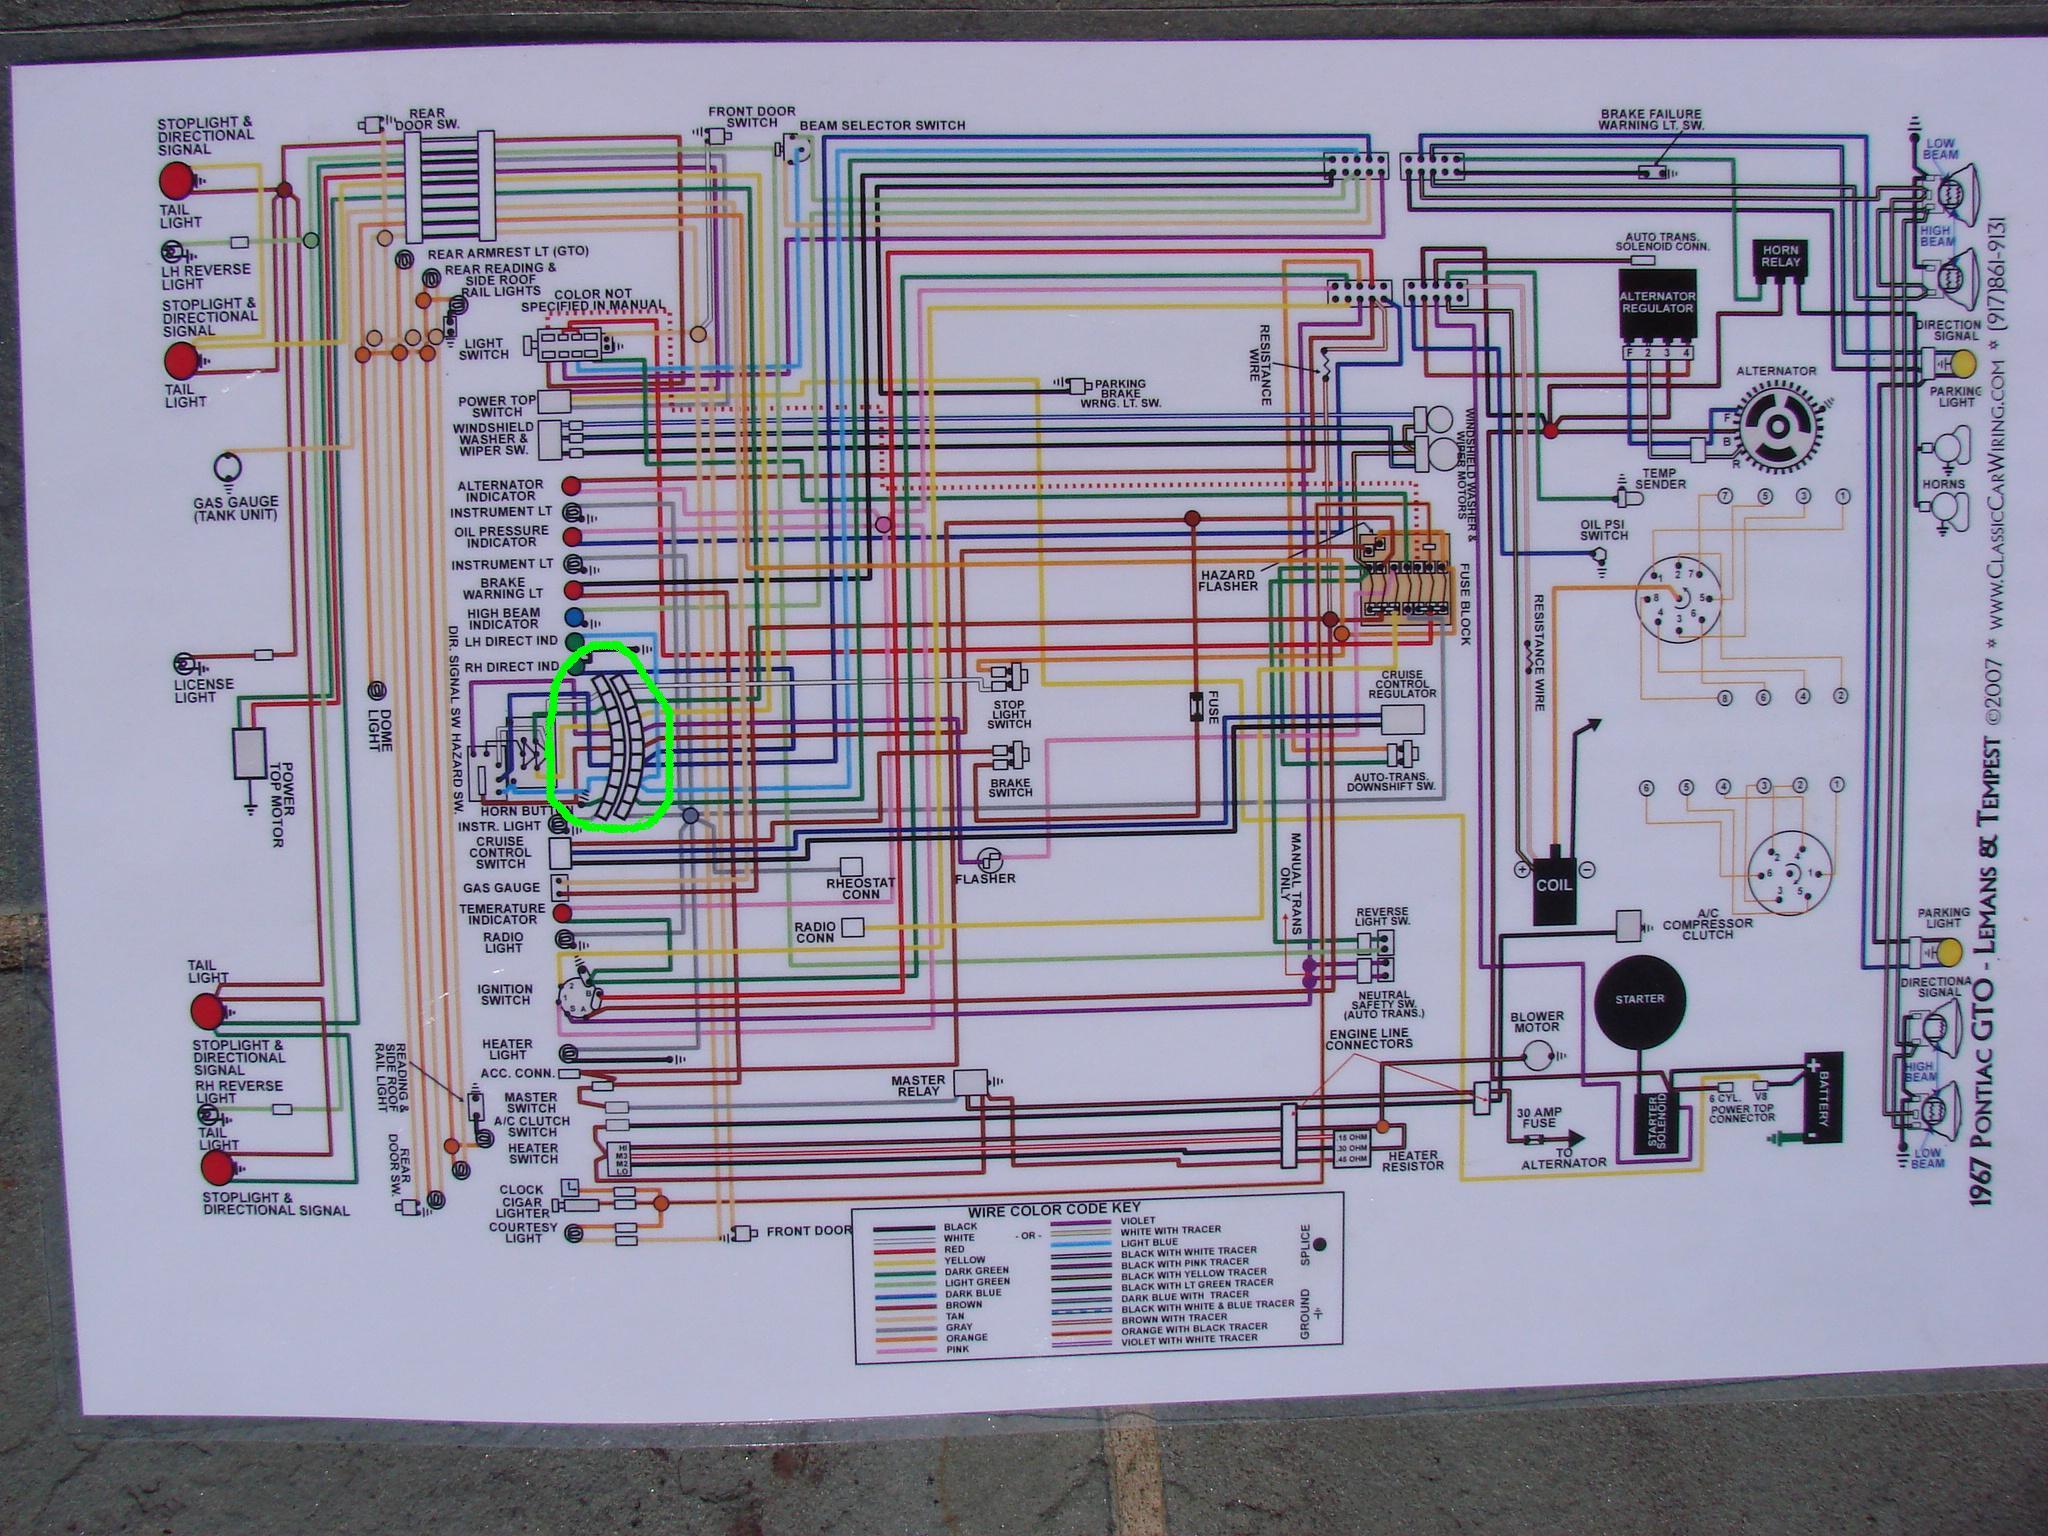 gm turn signal switch wiring diagram wiring diagram gm turn signal switch wiring diagram